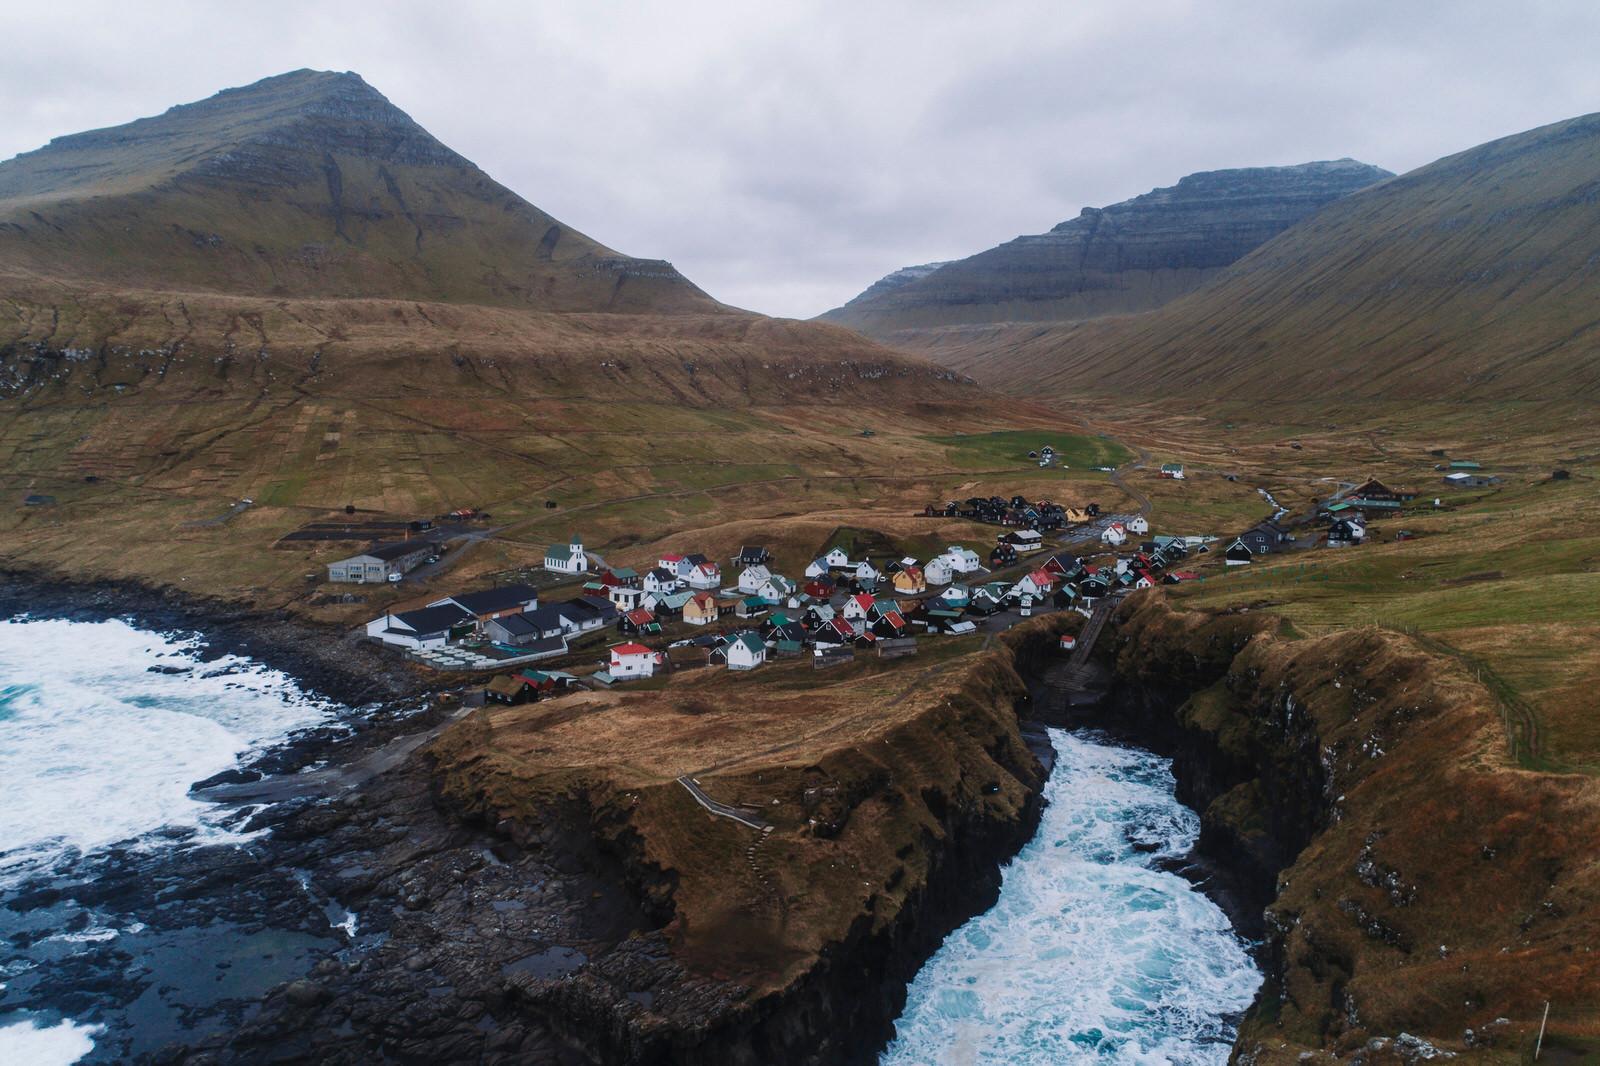 viaggio isole faroe_36.jpg